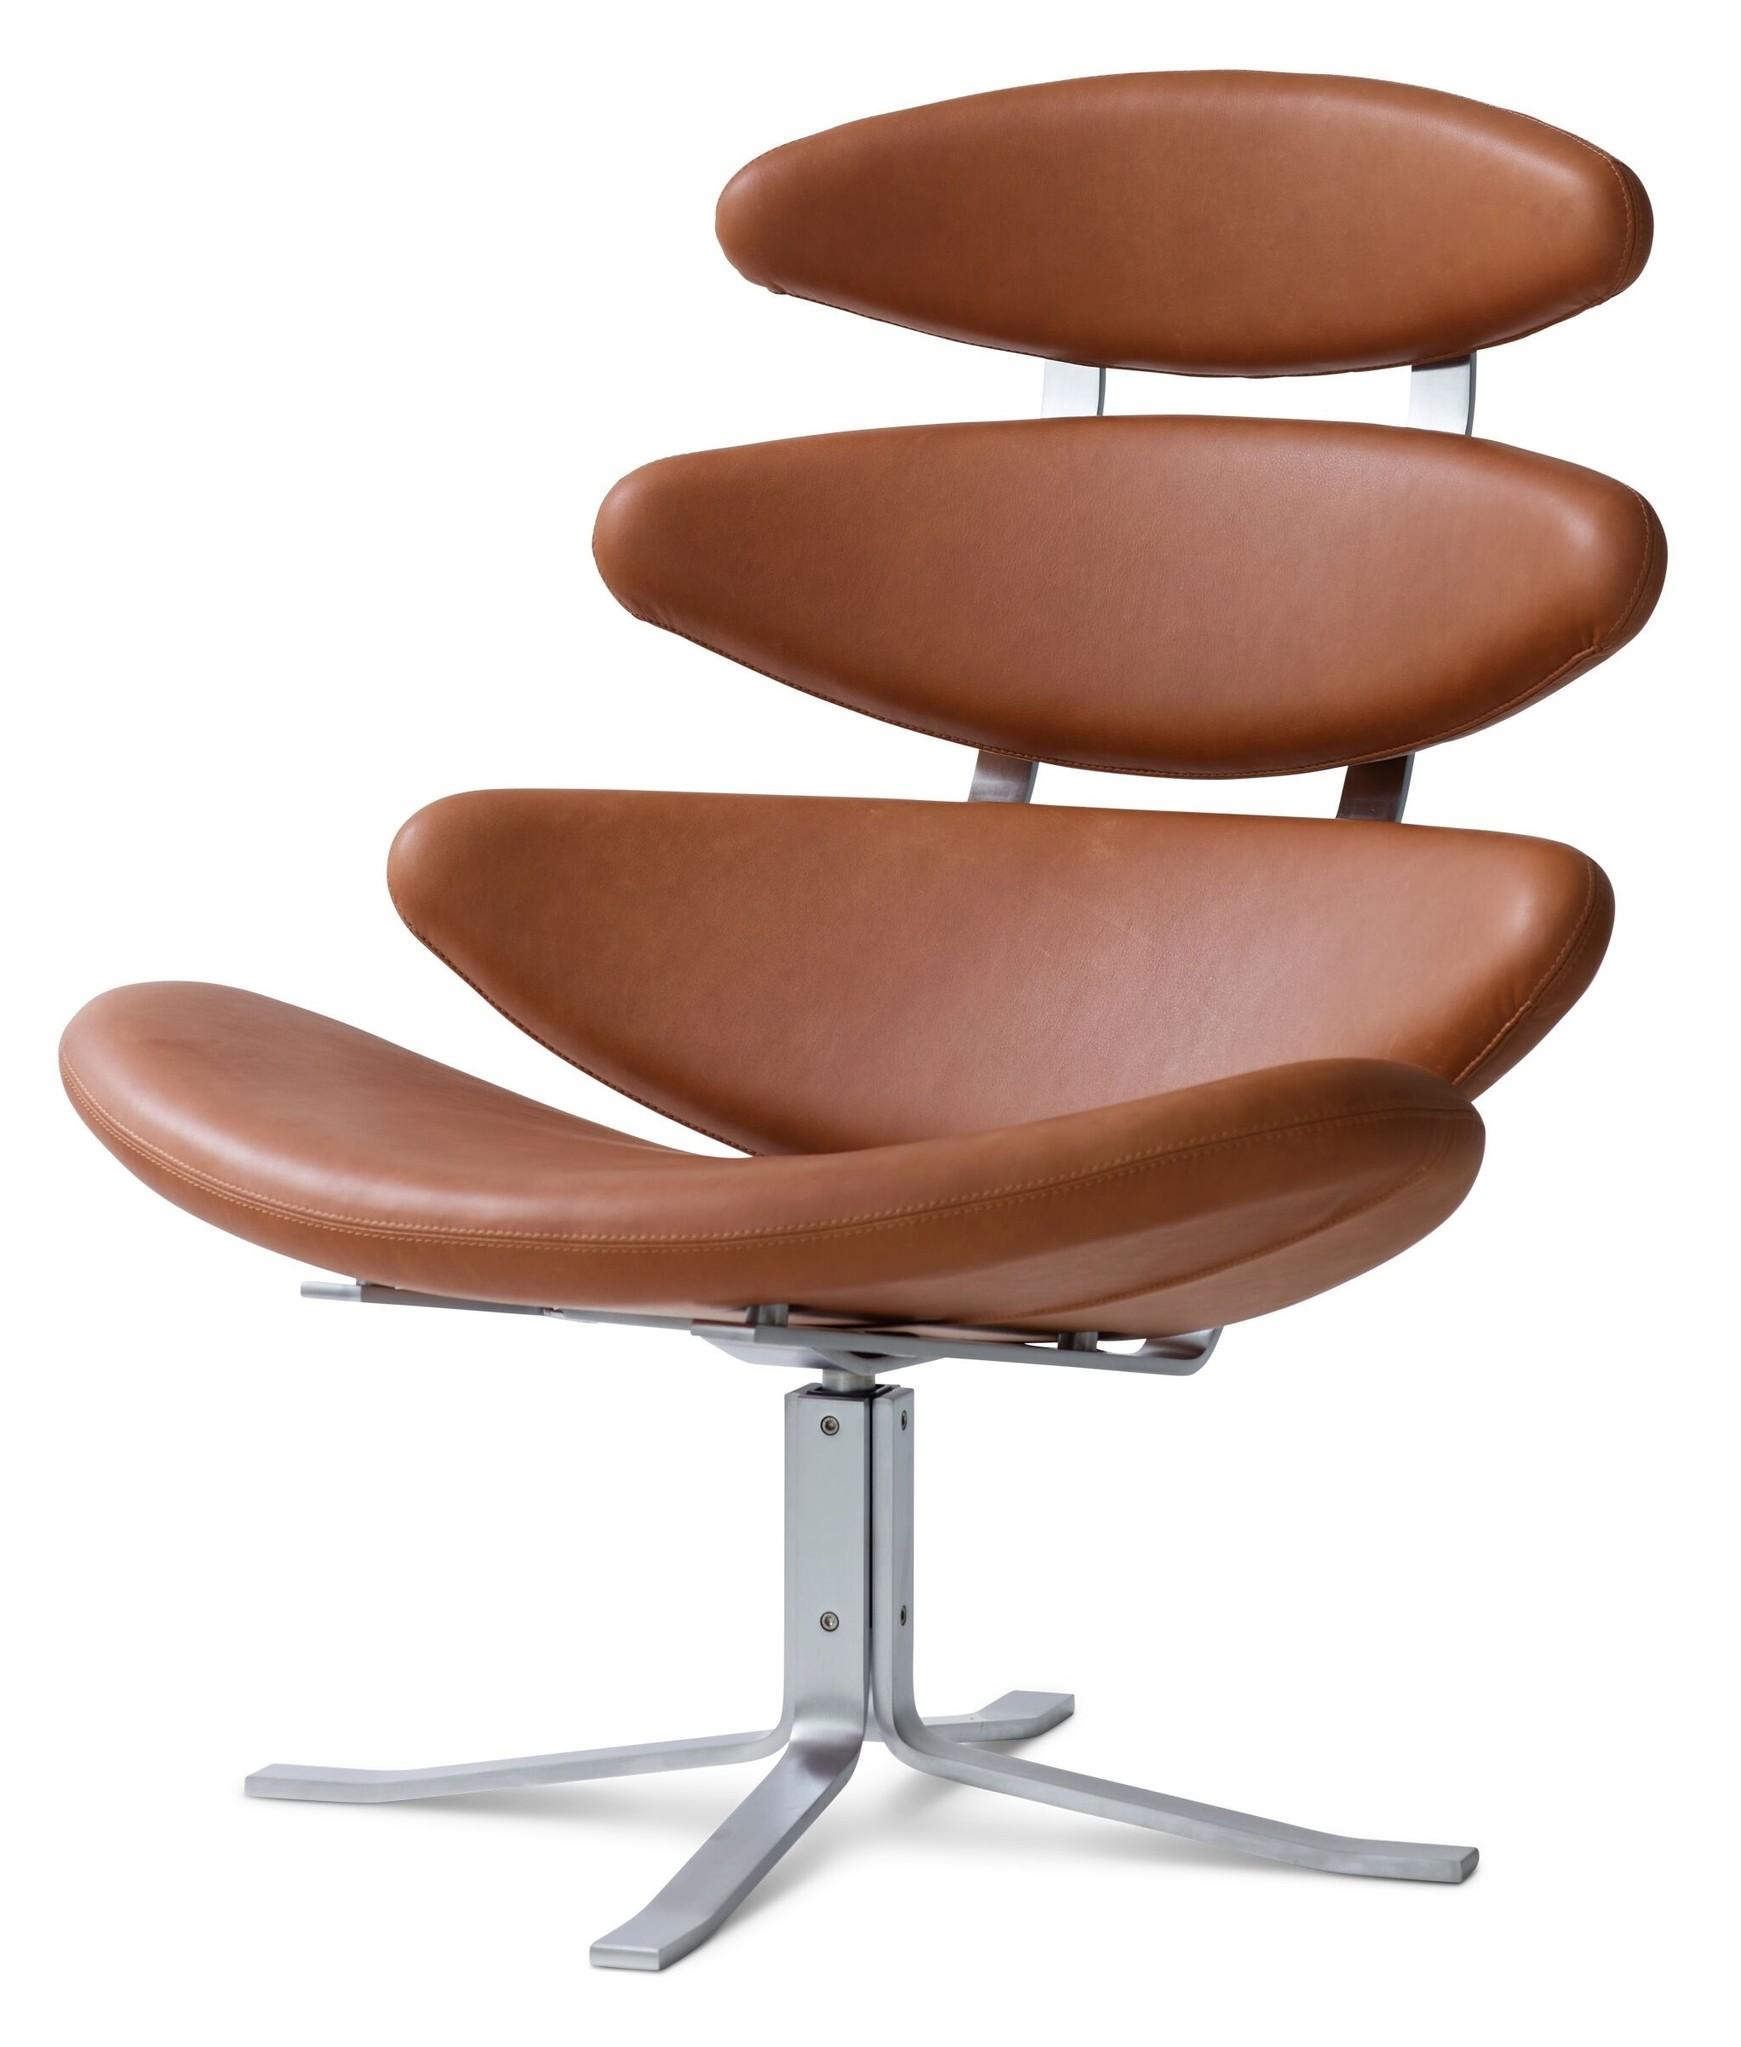 Leren Lounge Fauteuil.Erik Jorgensen Corona Lounge Stoel Design Online Meubels